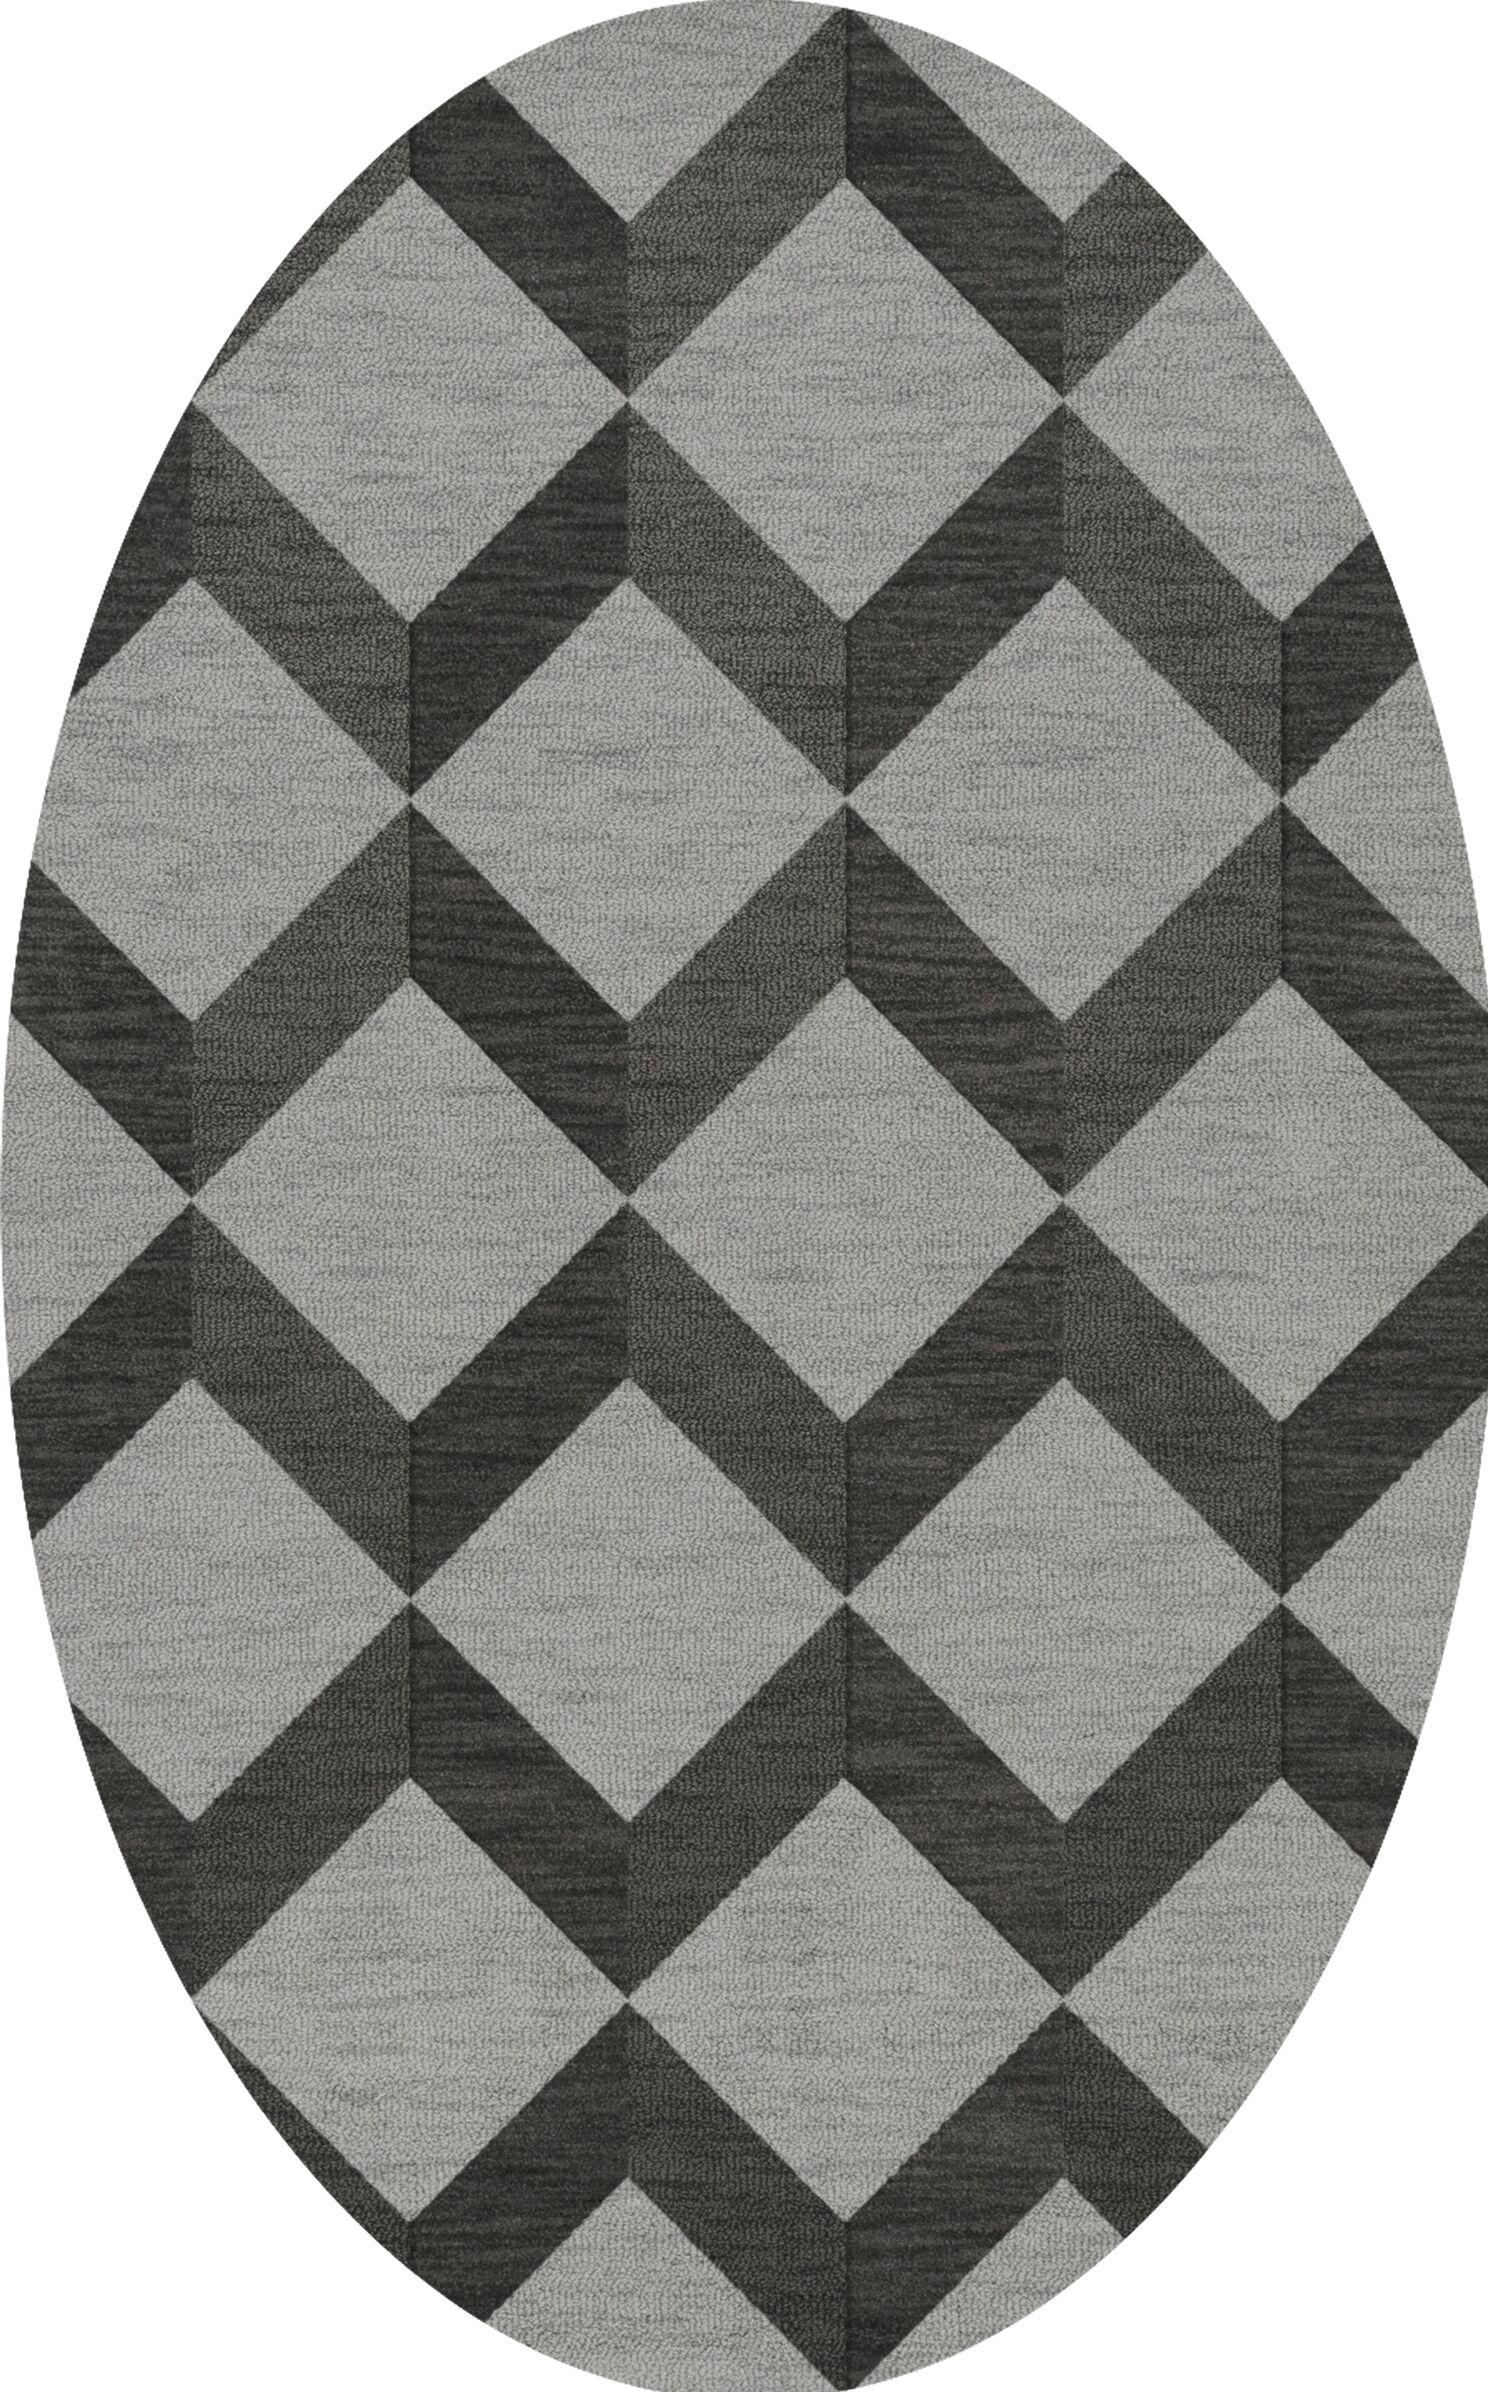 Bella Machine Woven Wool Gray/Black Area Rug Rug Size: Oval 10' x 14'